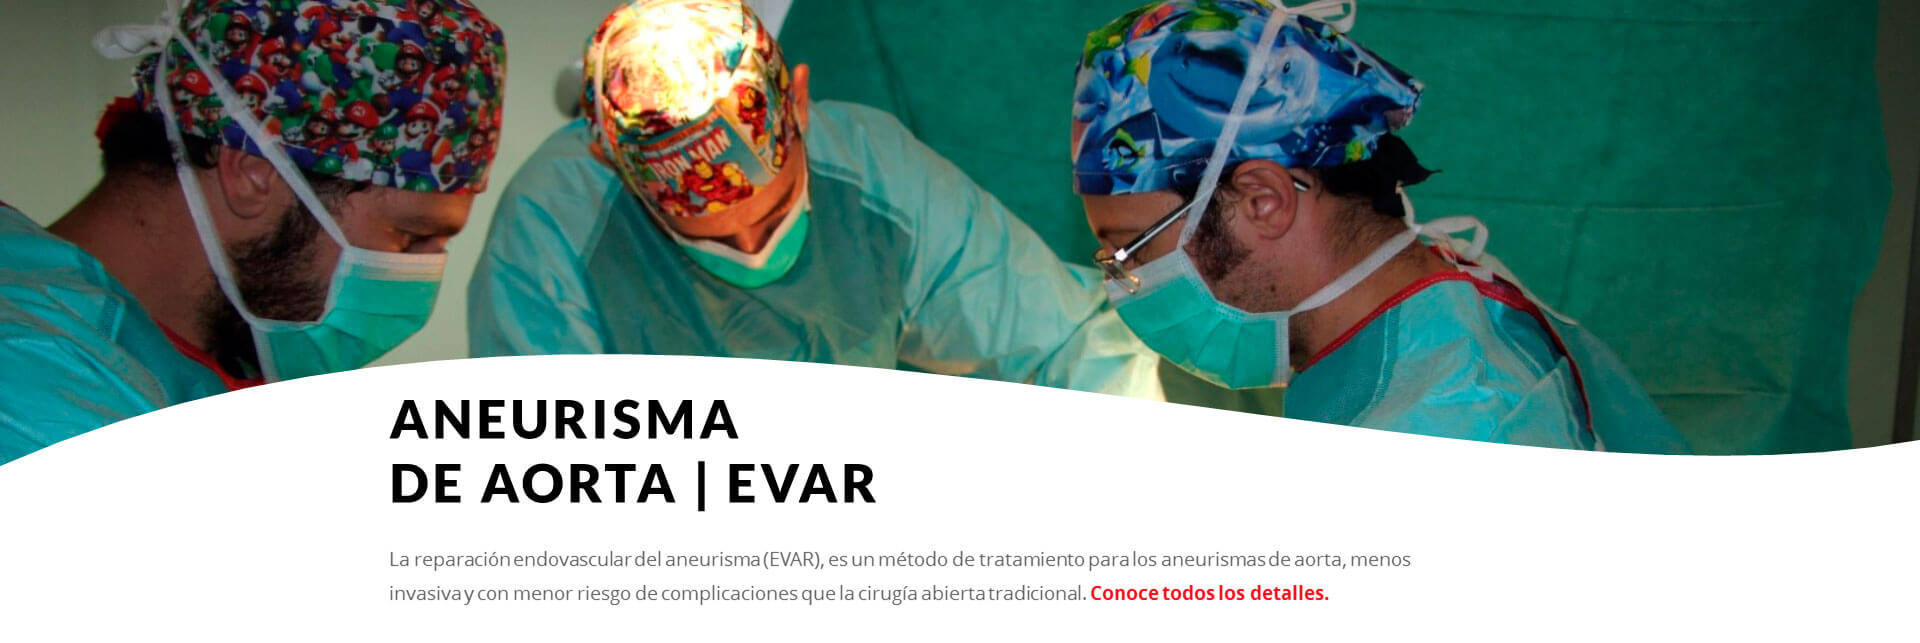 aneurisma de aorta EVAR